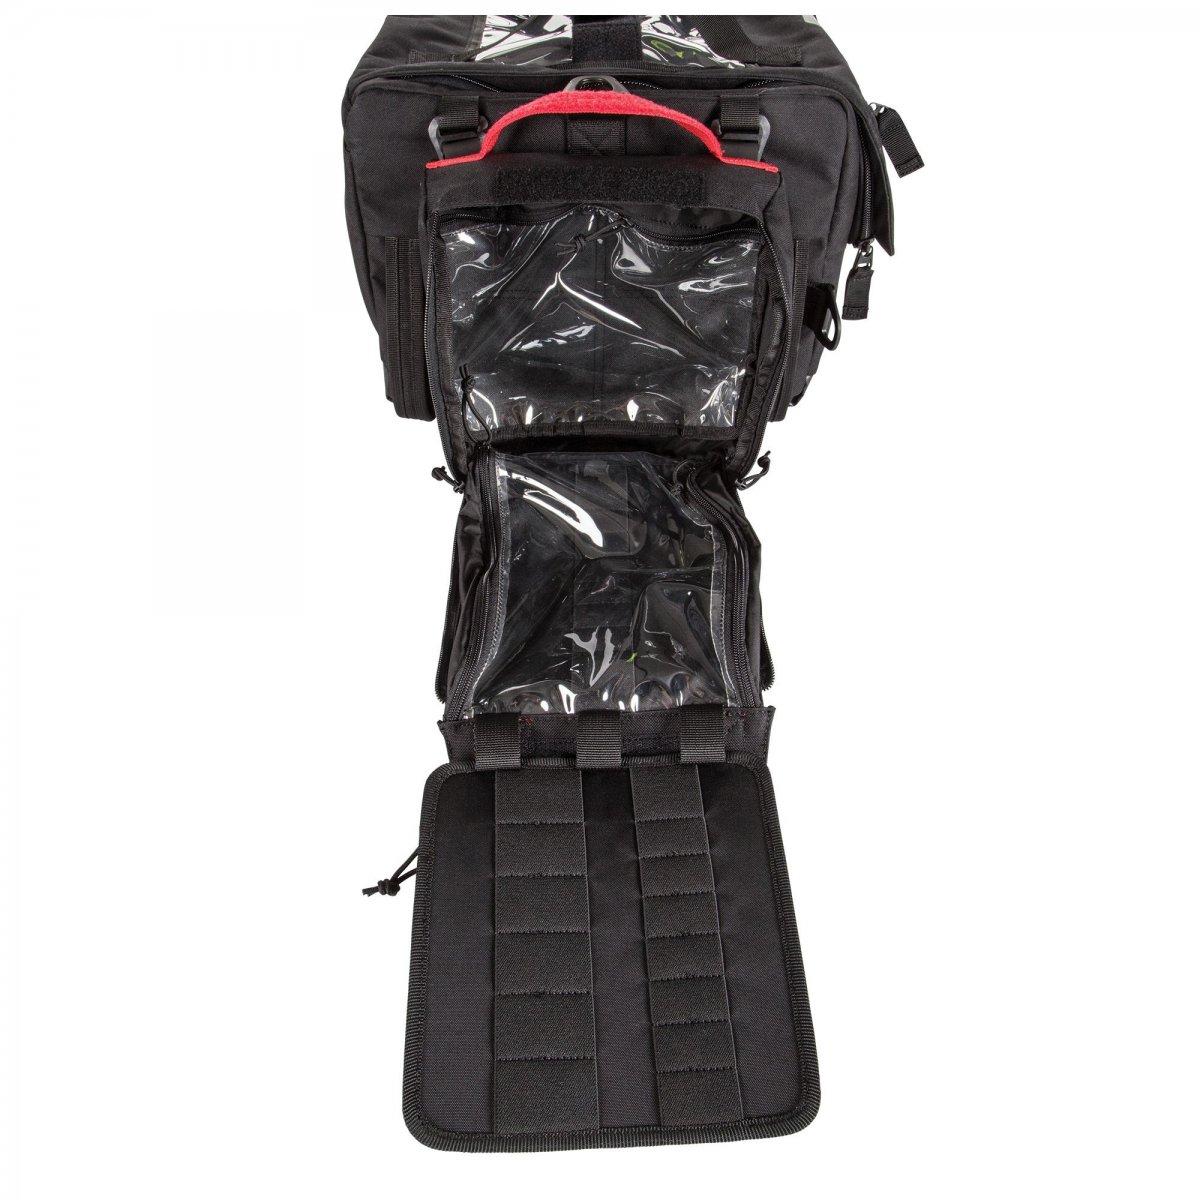 fd4e510098b 5.11 Tactical Med Pouch Gear Set - 5.11 Tactical